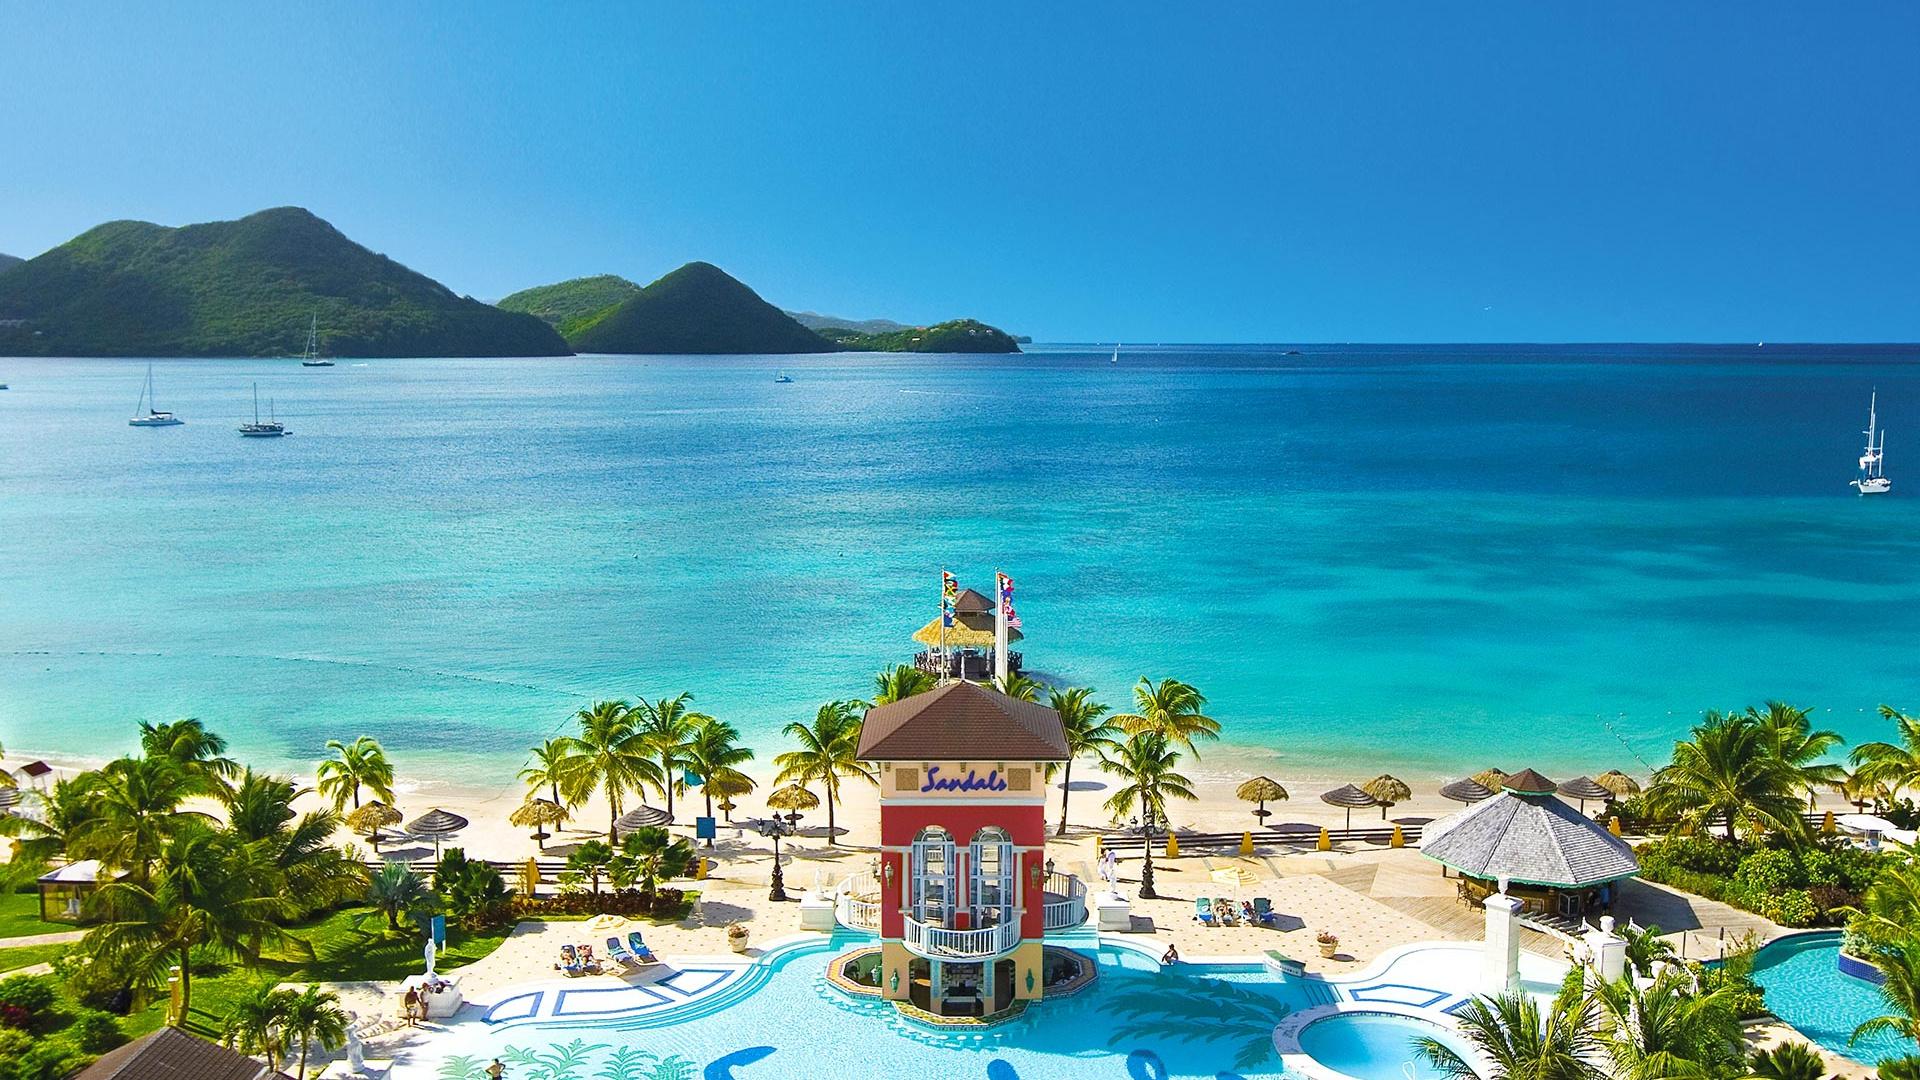 Sandals Grande Saint Lucian pool